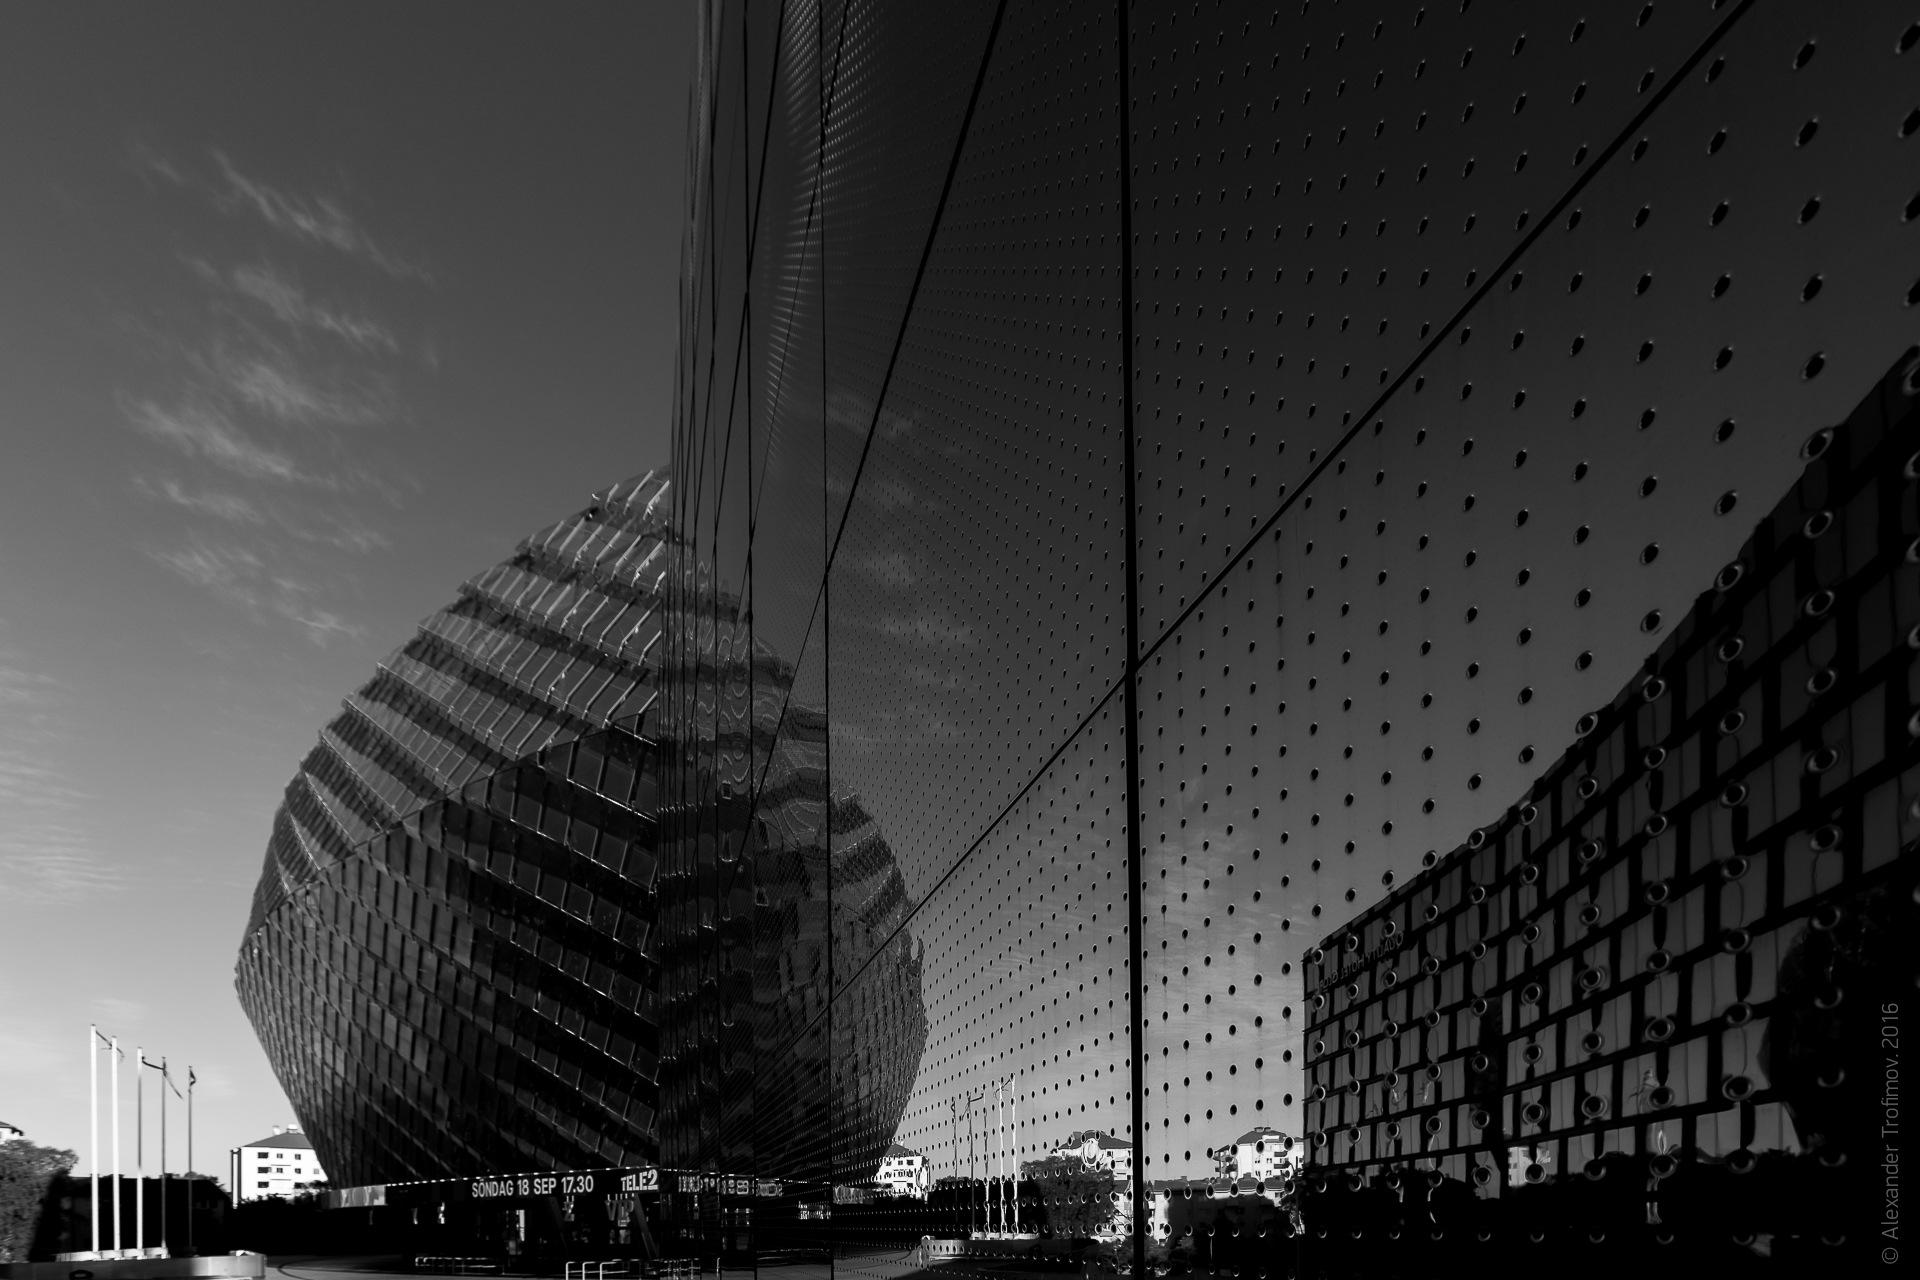 Tele2 Arena by Alexander Trofimov